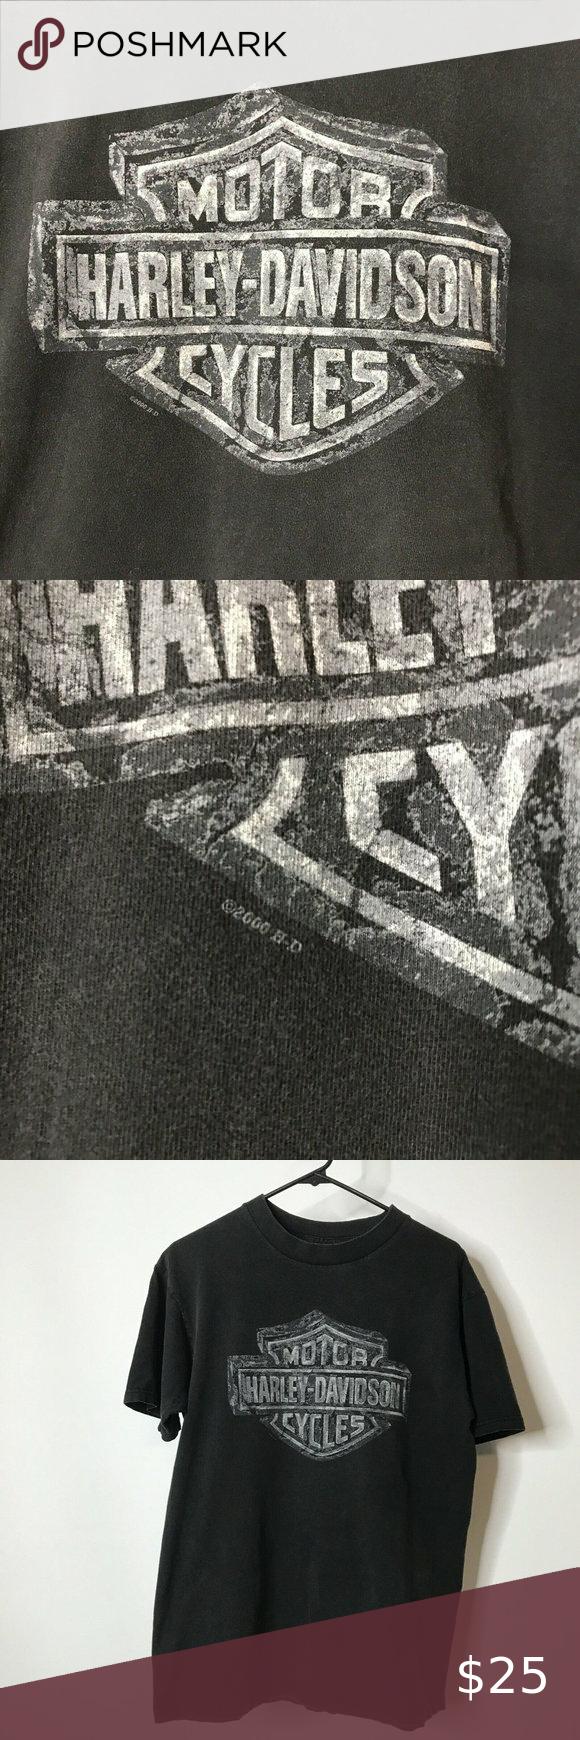 Vintage 2000 Harley Davidson Motorcycles T-Shirt L in 2020 ...